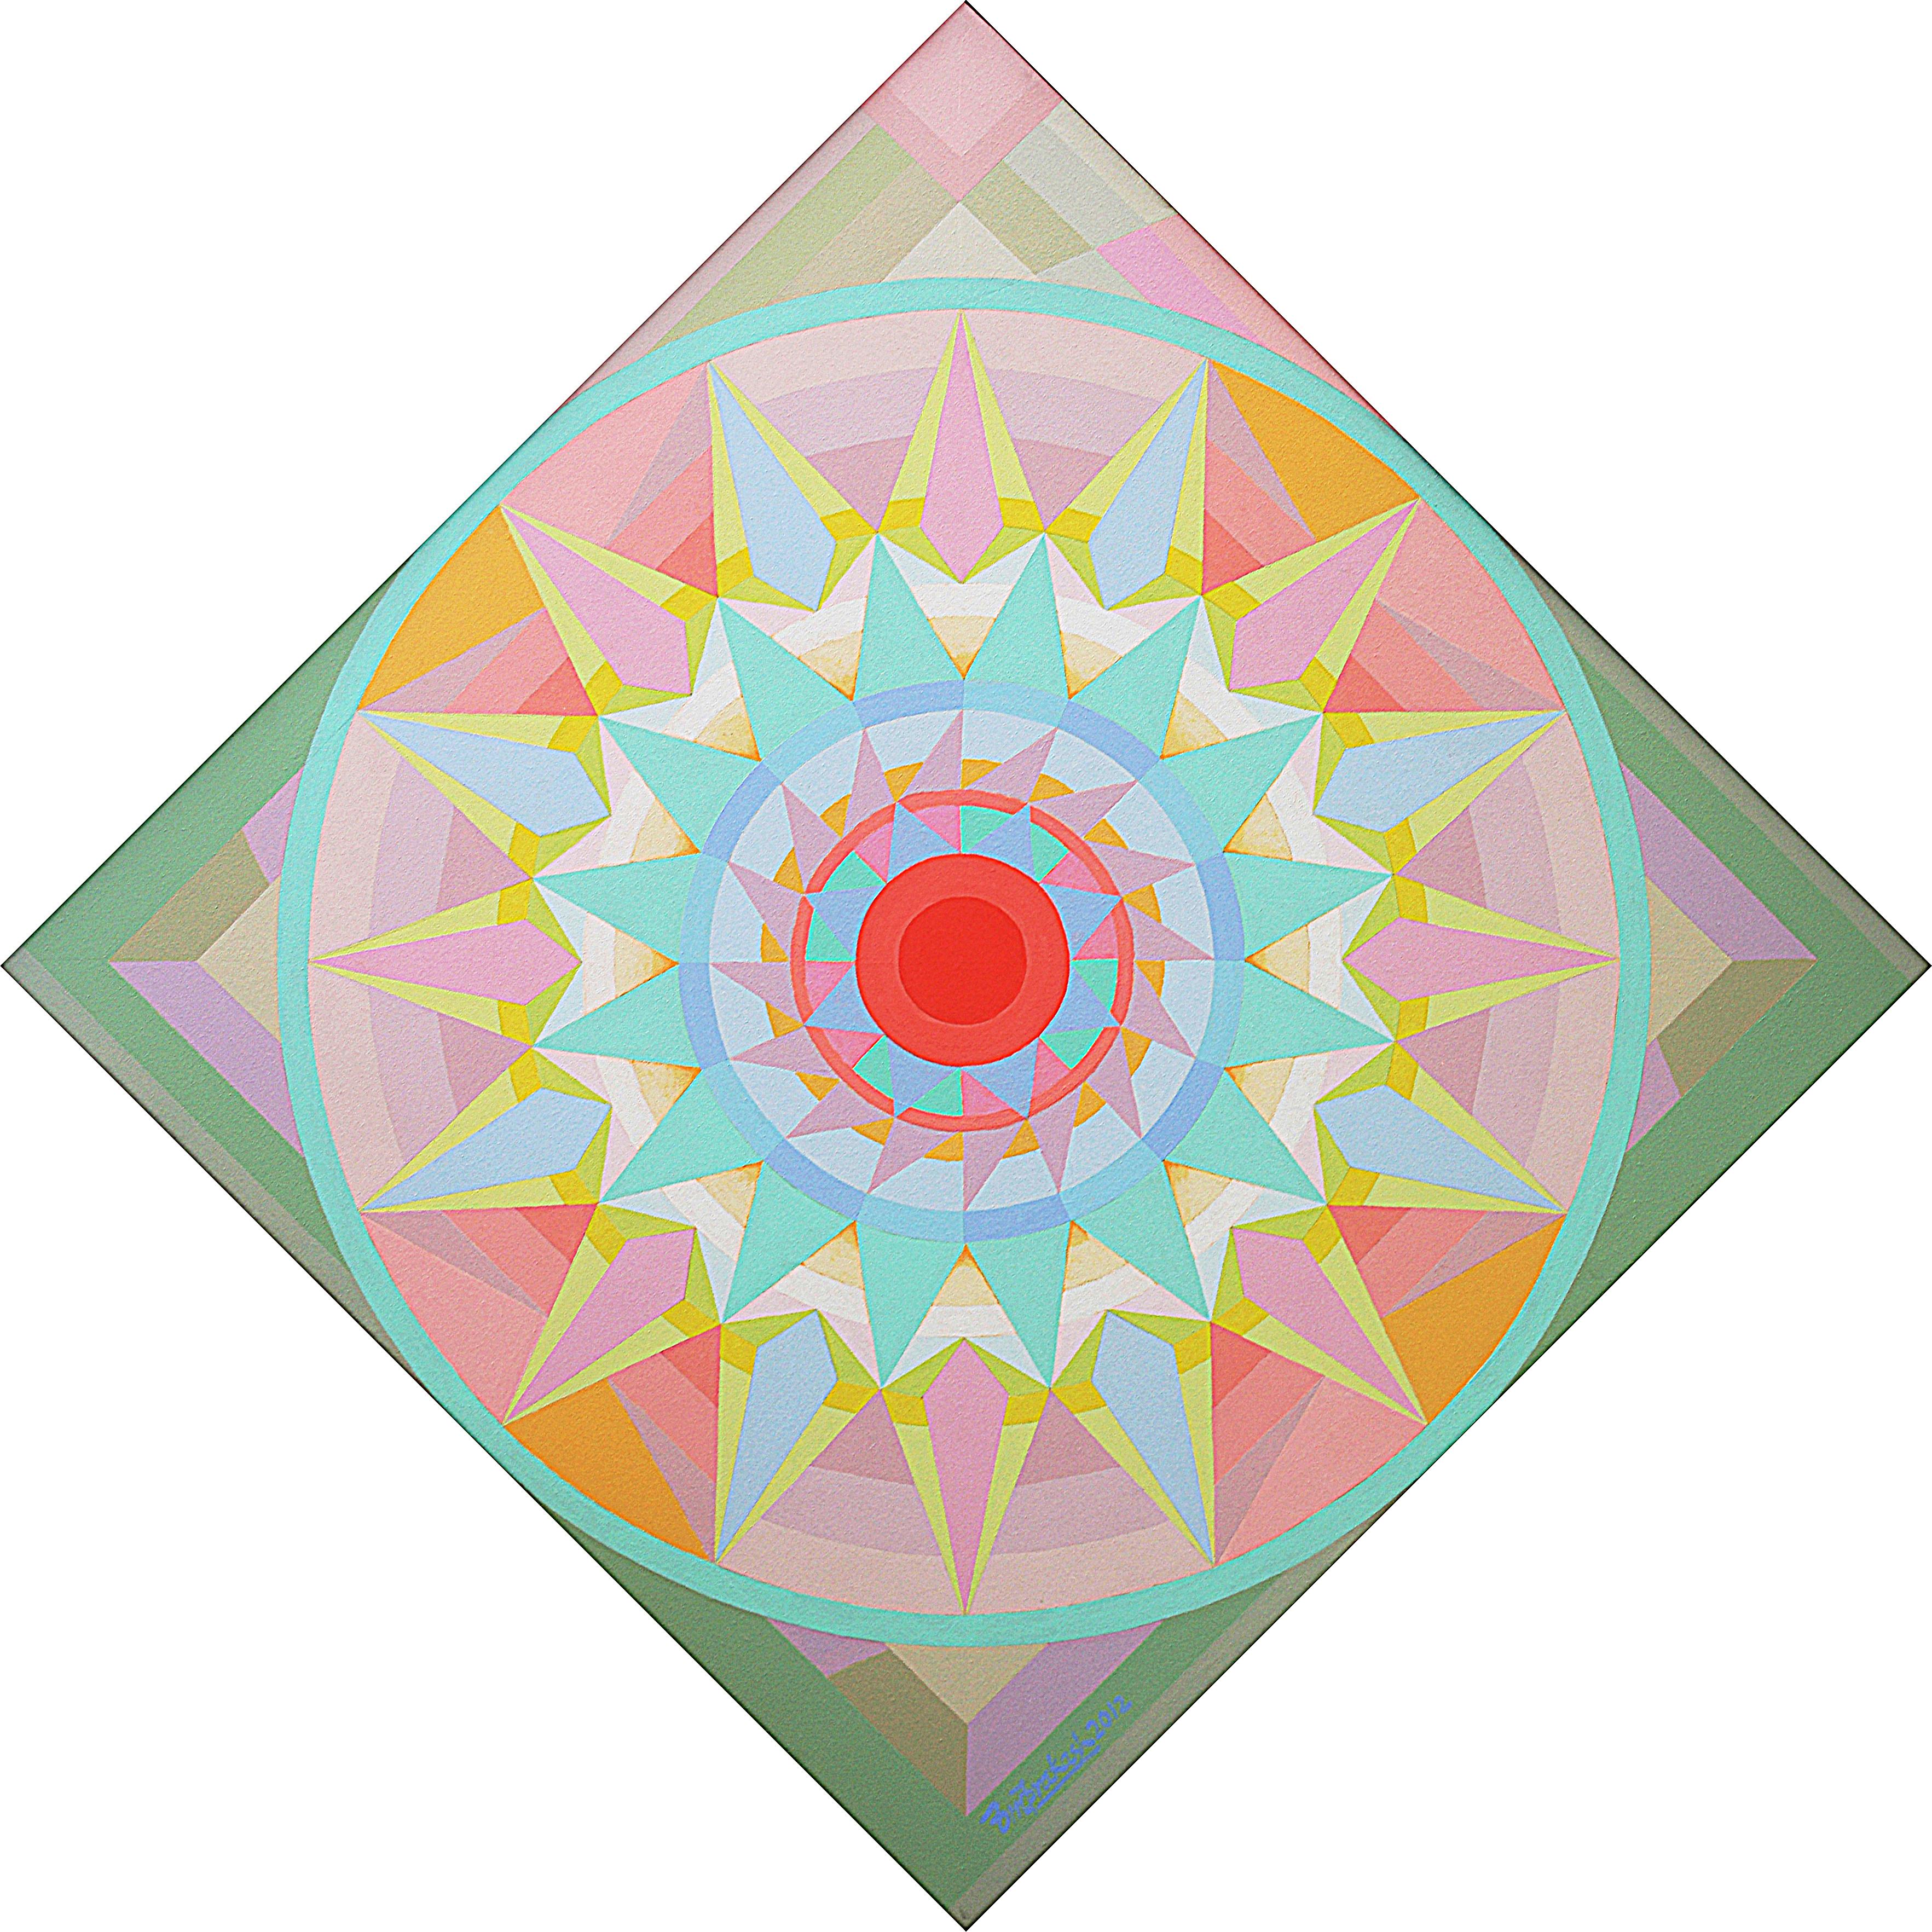 Joy Mandala Ii 44 X44 2012